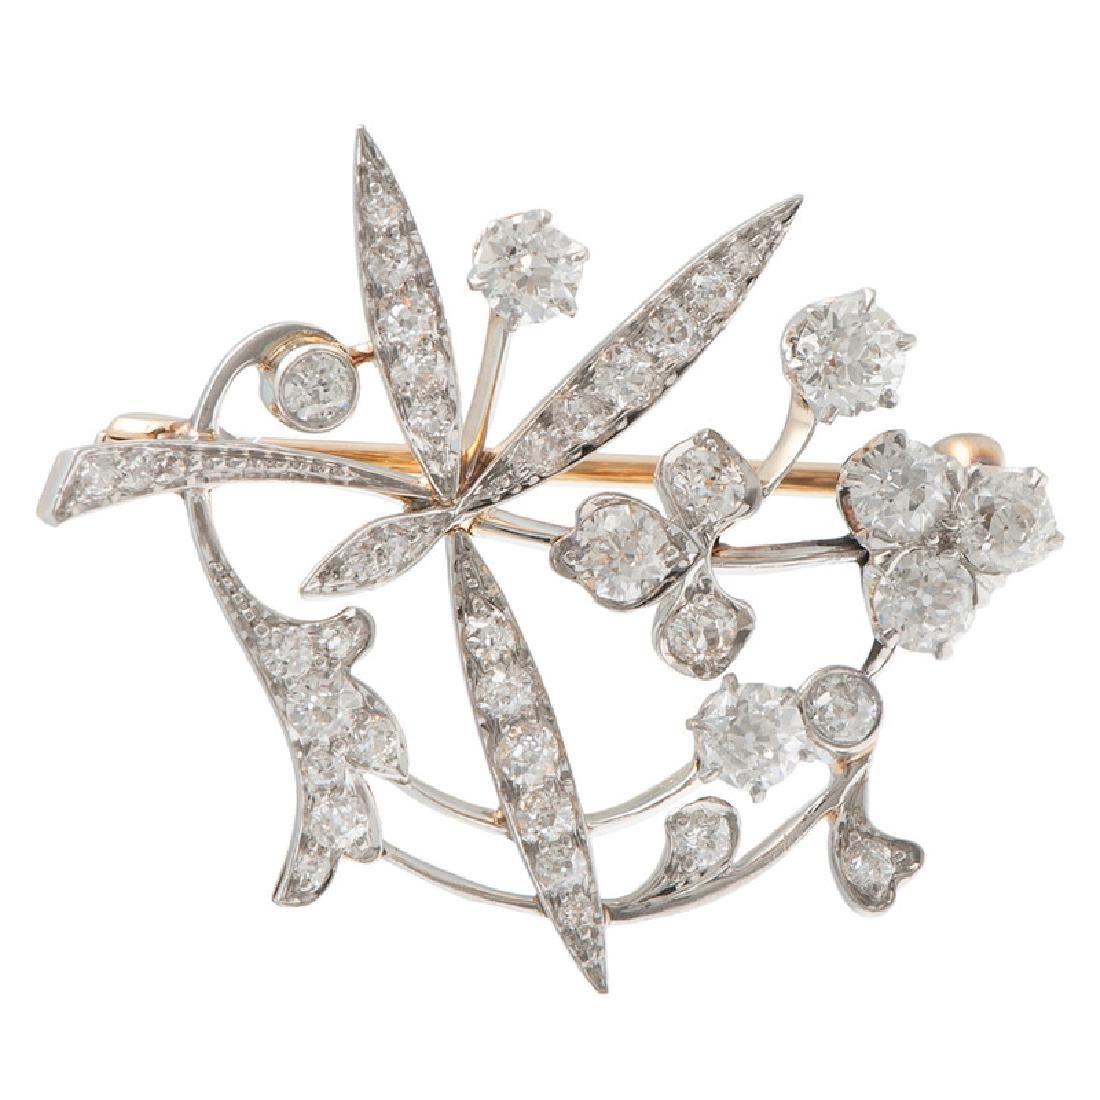 18 Karat Gold and Platinum Diamond Brooch